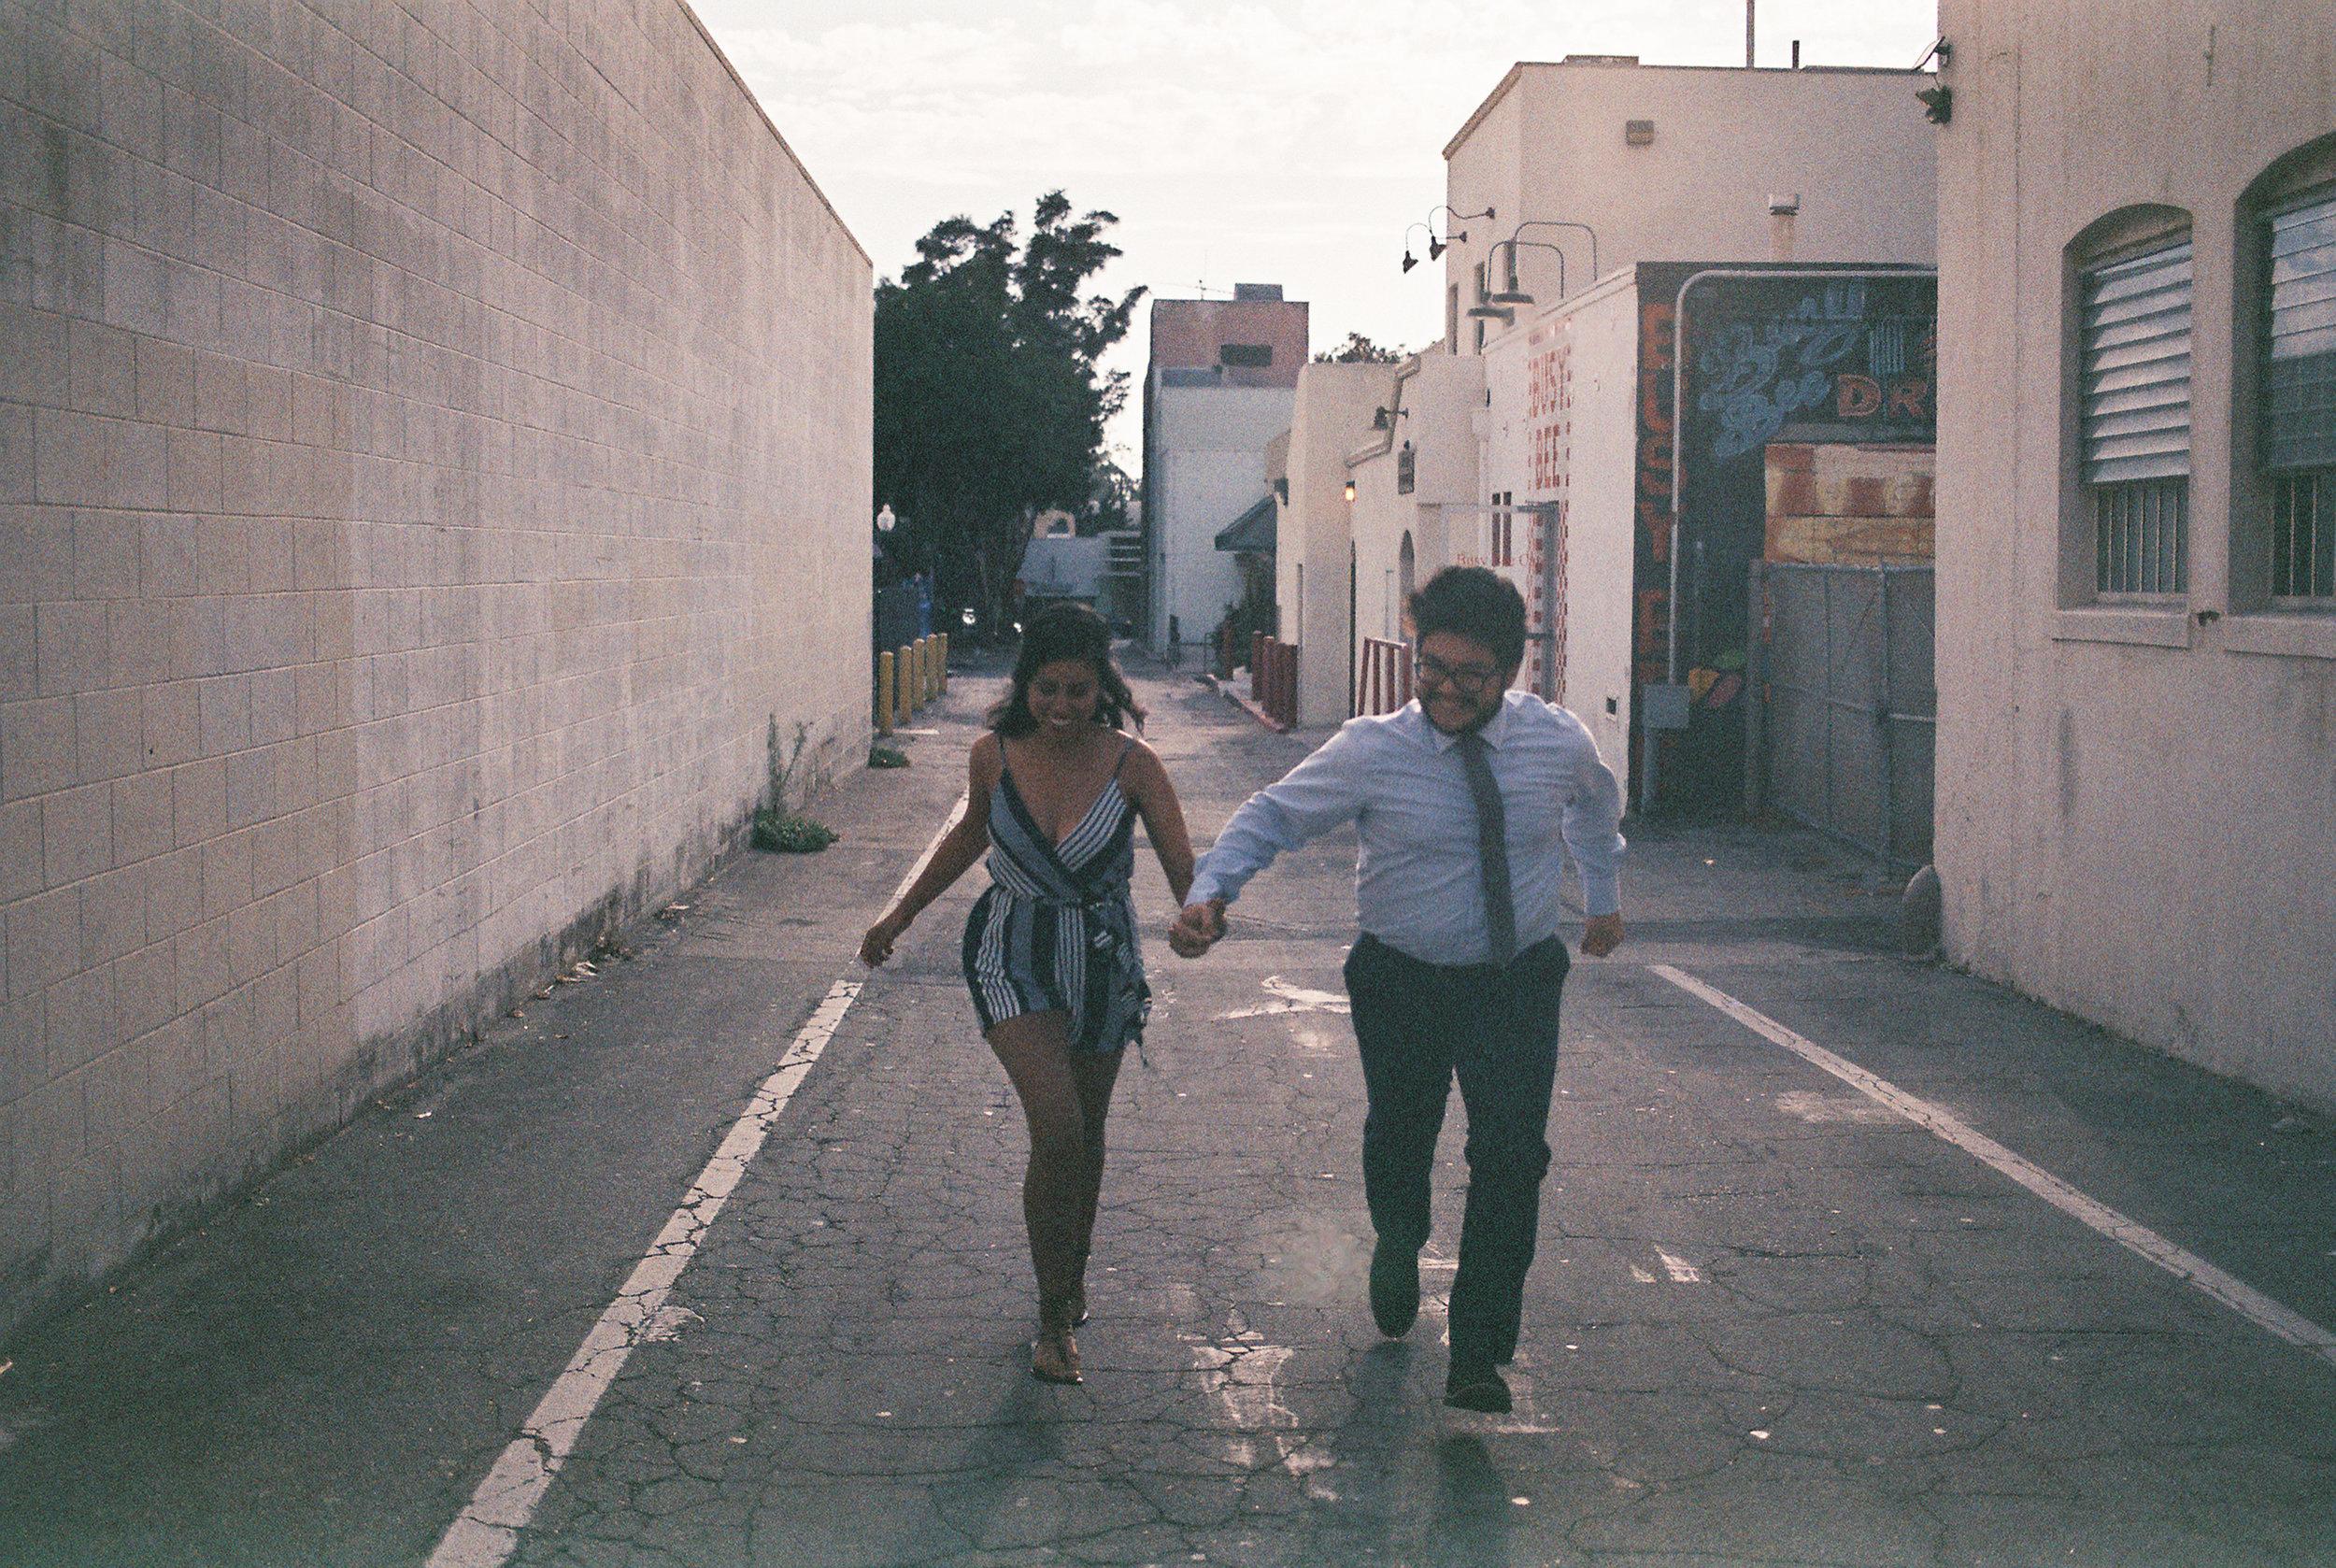 35mm Film-0006.jpg